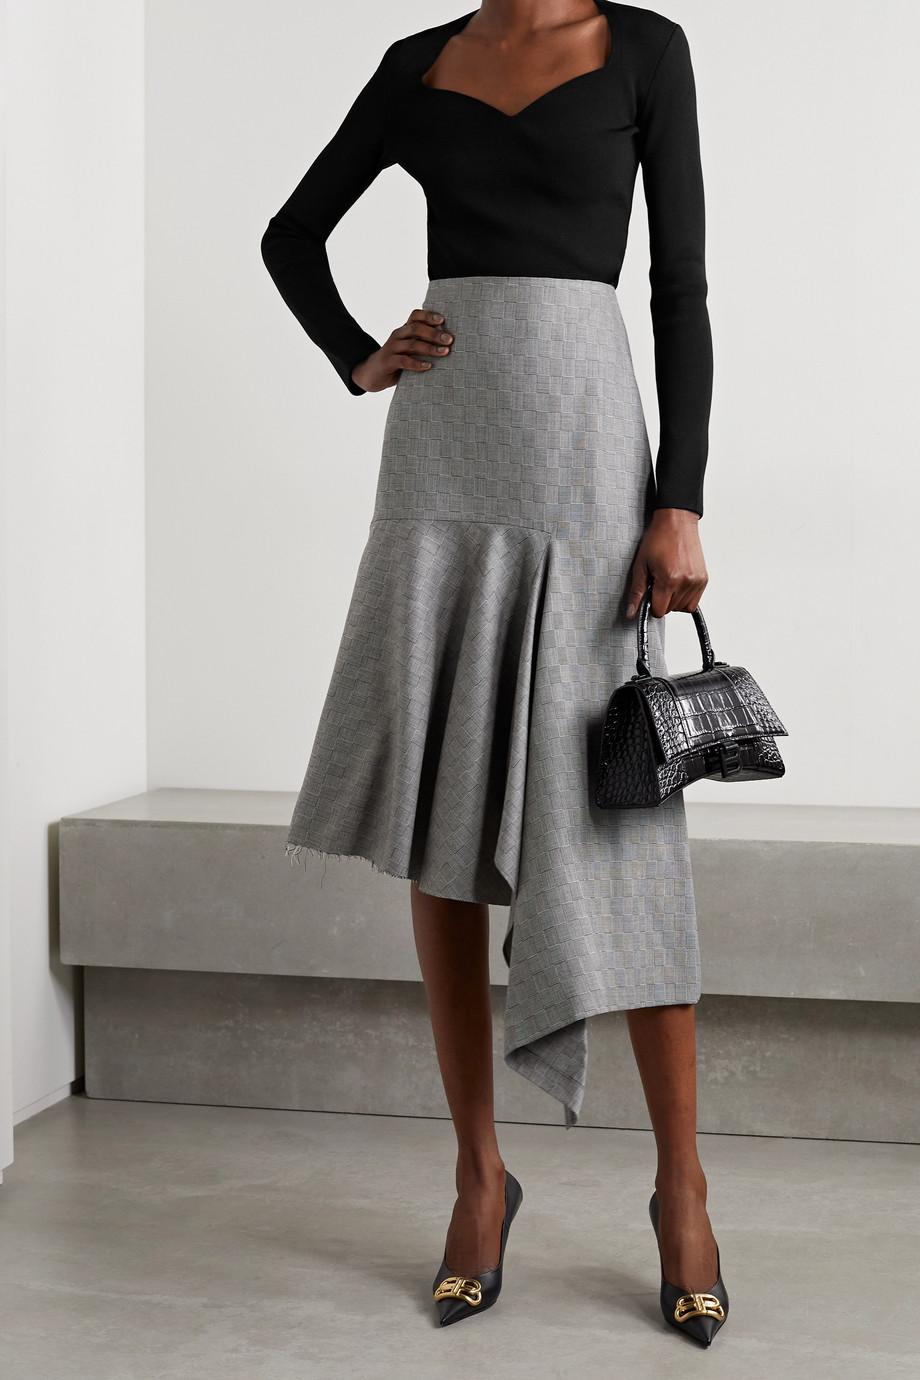 Balenciaga Ribbed stretch-knit top